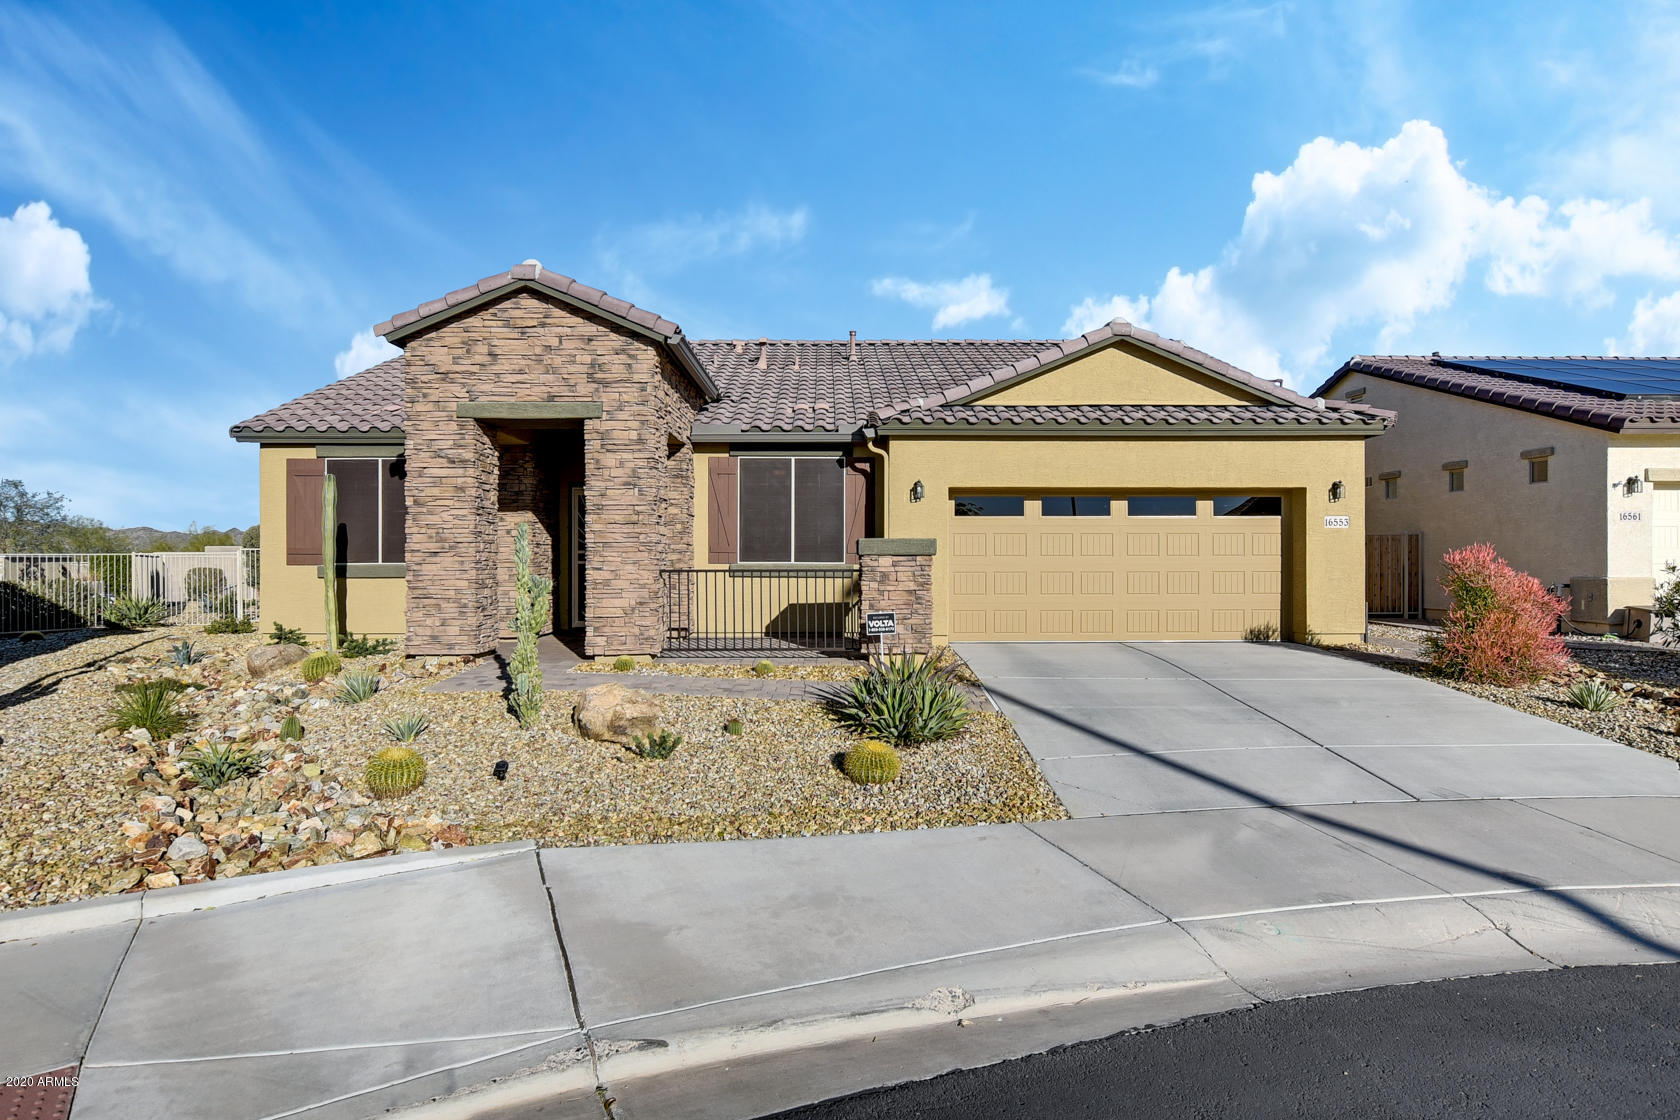 Photo of 16553 S 175TH Drive, Goodyear, AZ 85338